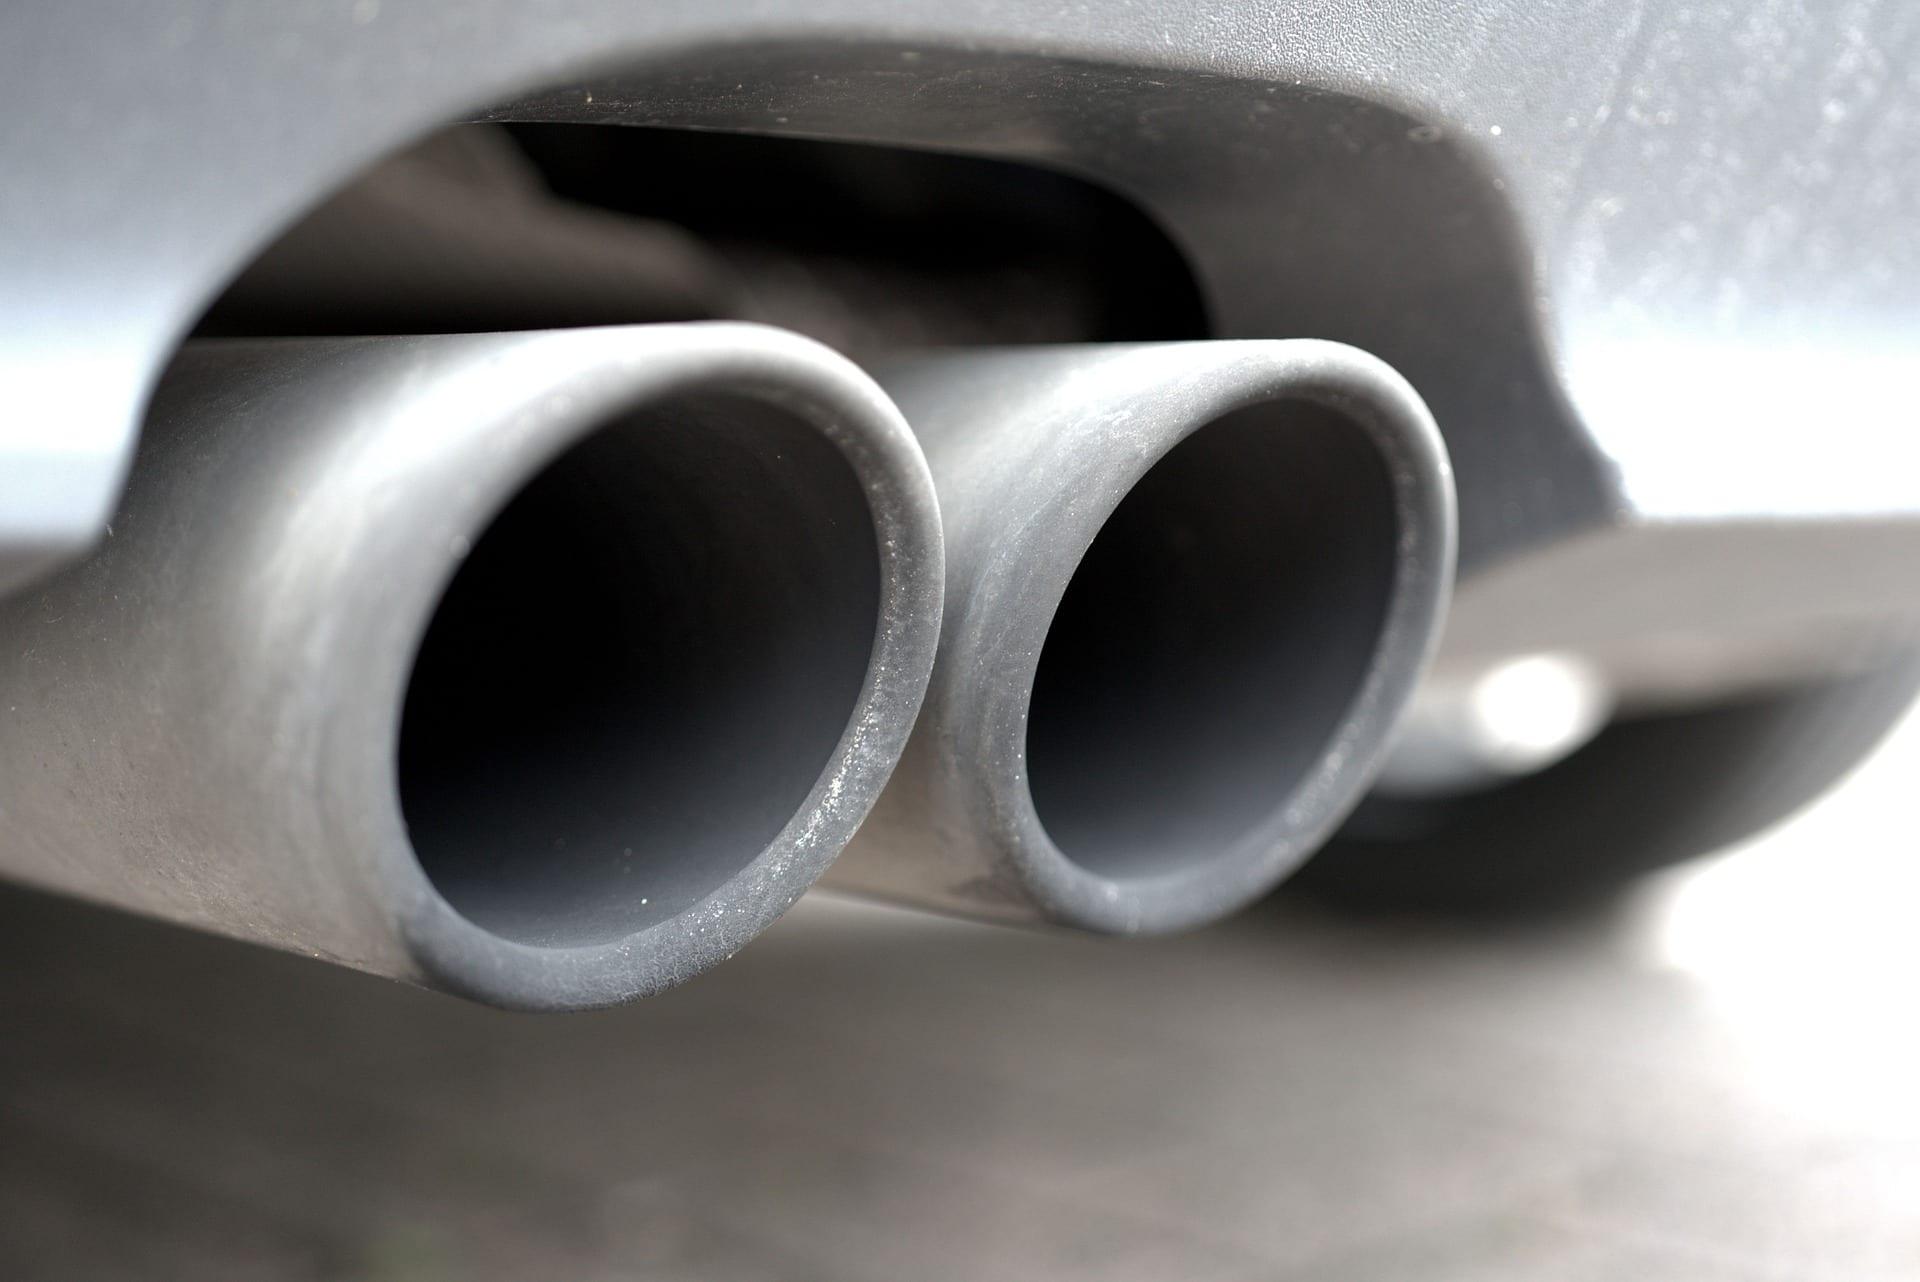 Potholes can damage car exhausts